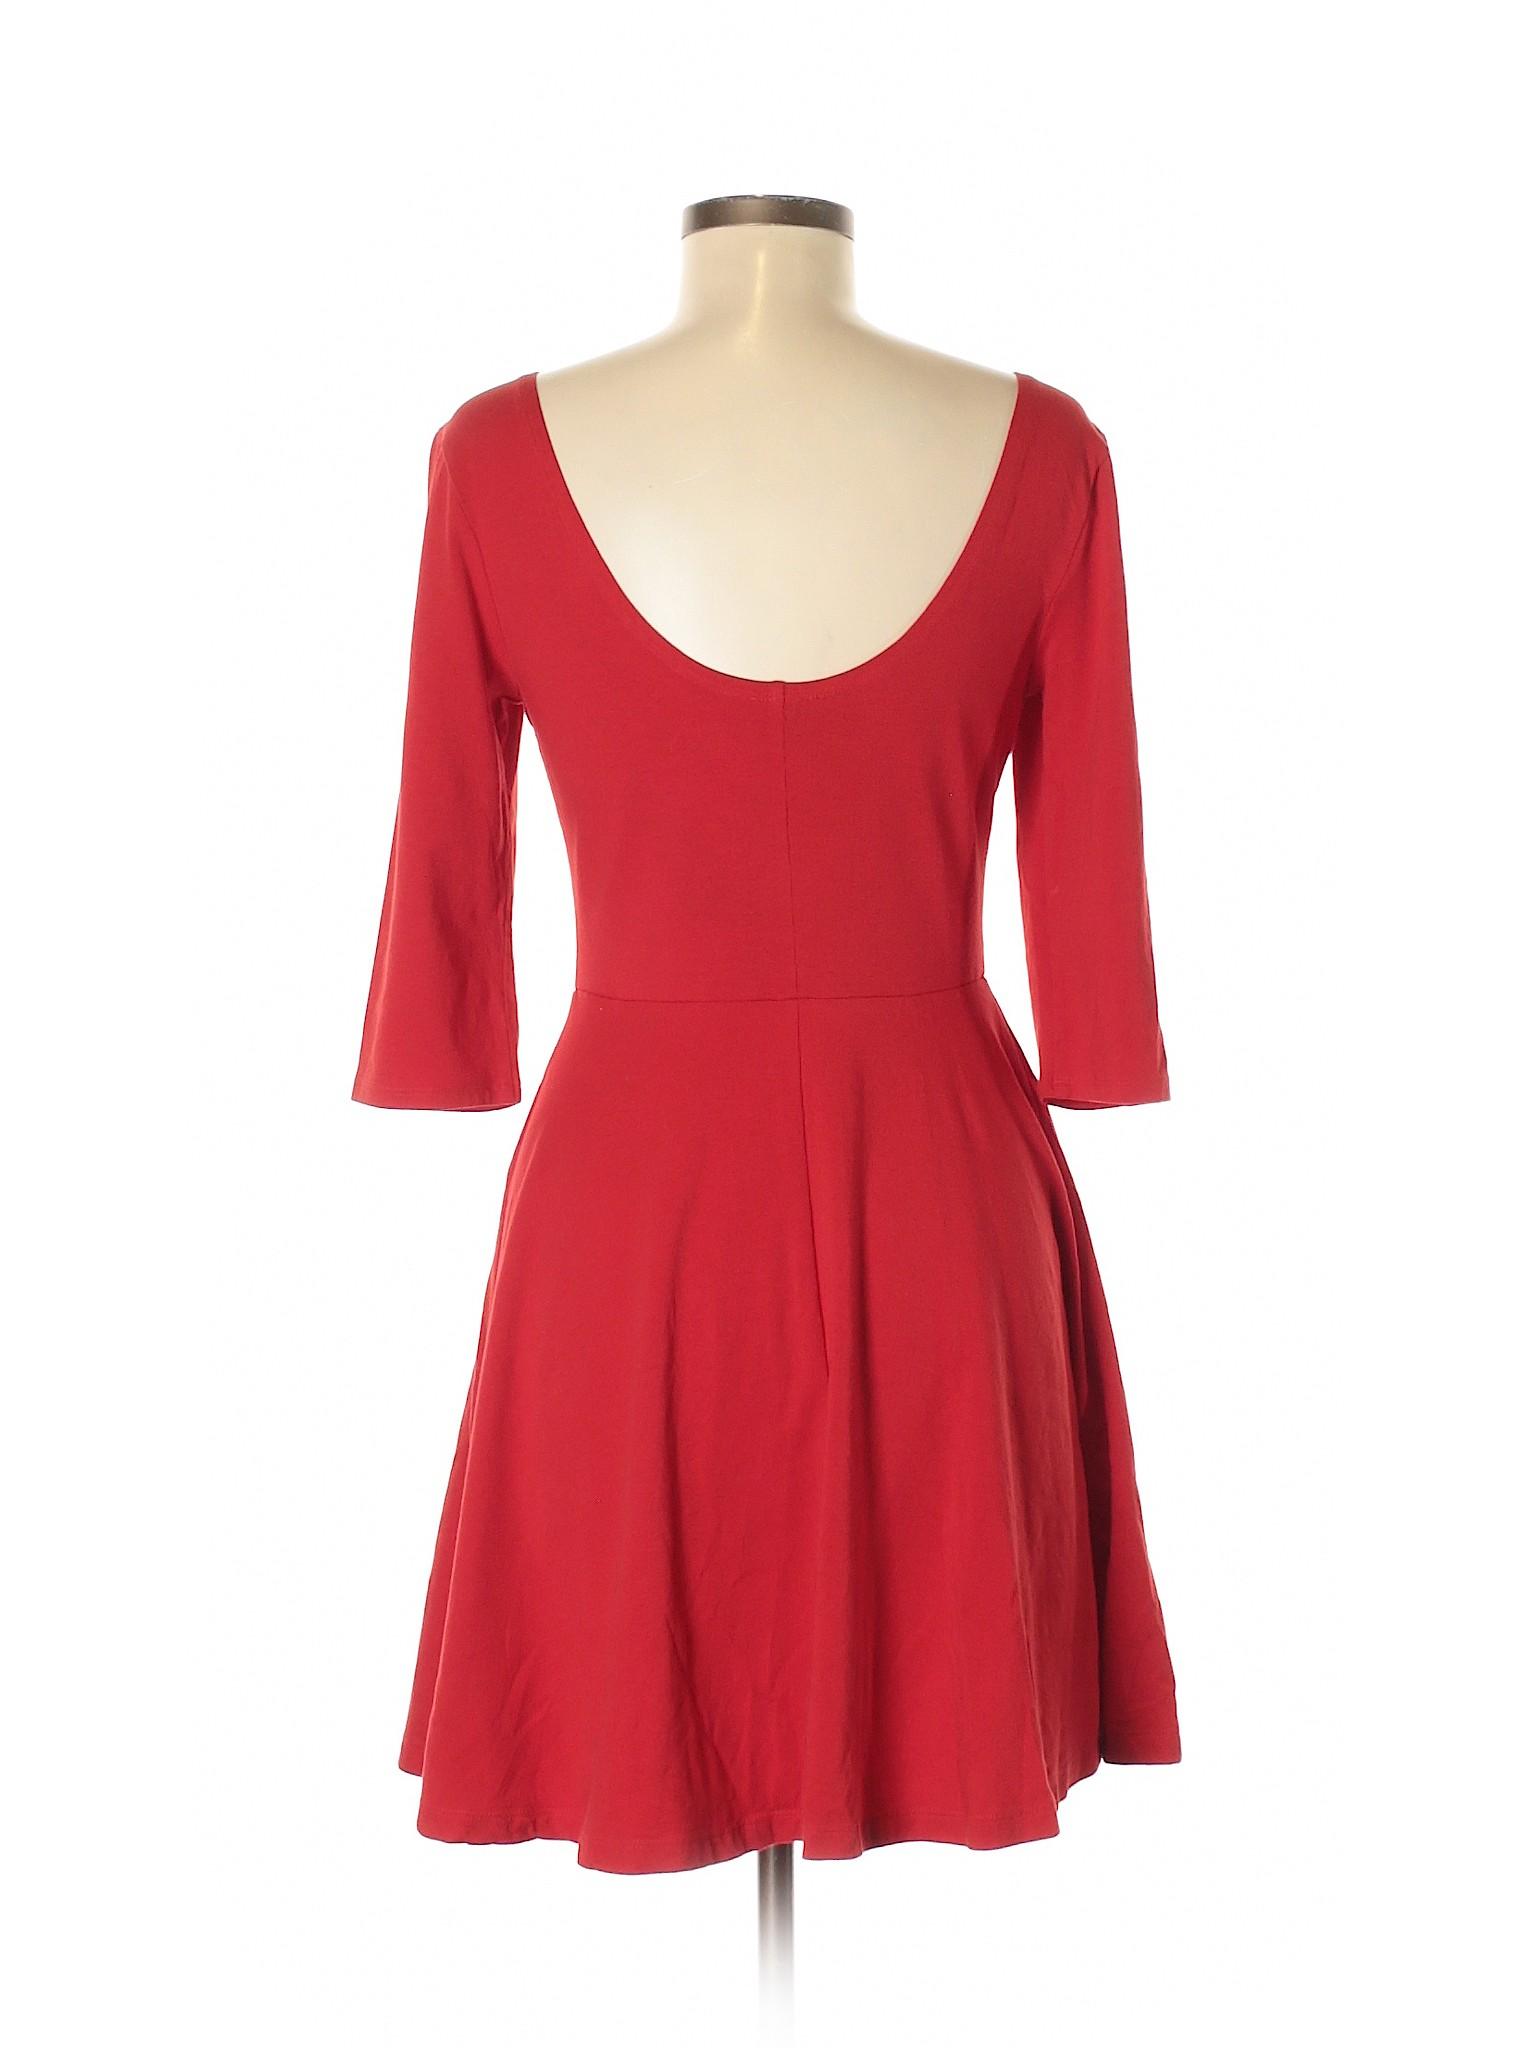 Casual winter Express Dress Boutique Outlet t64cWq